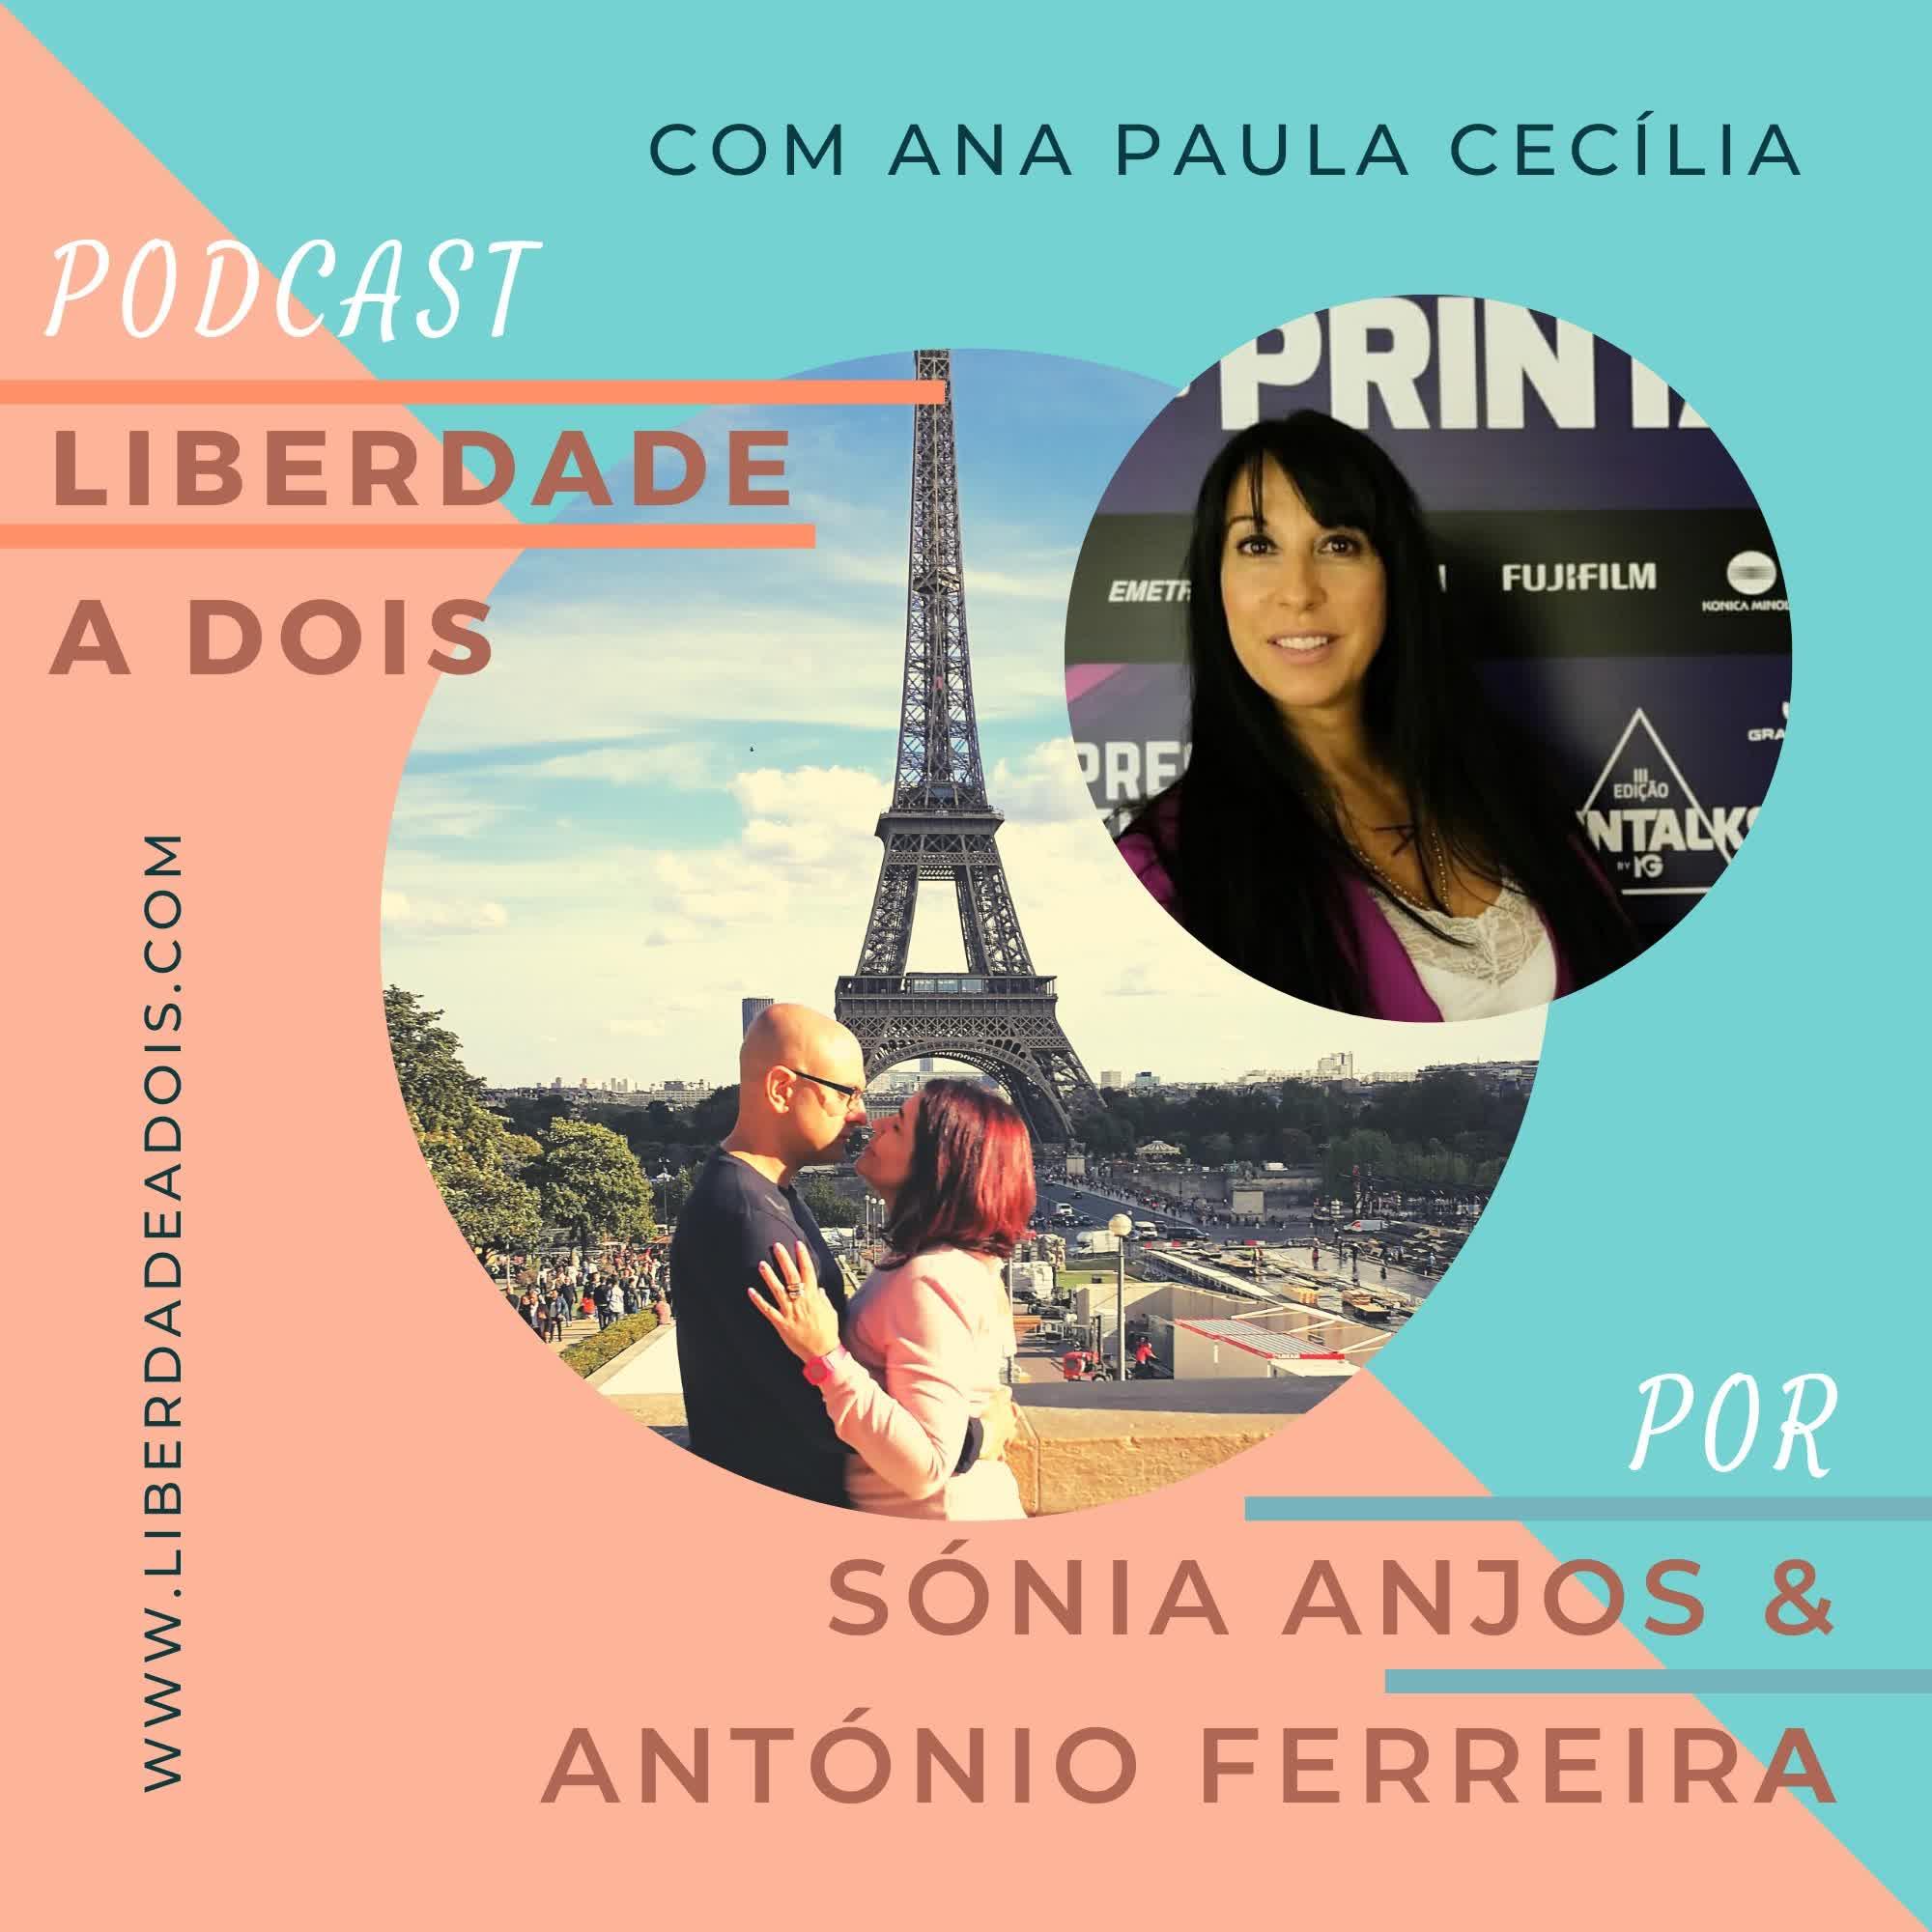 # 28 - Ana Paula Cecília CEO da ULTRAPRINT - Realidade Aumentada